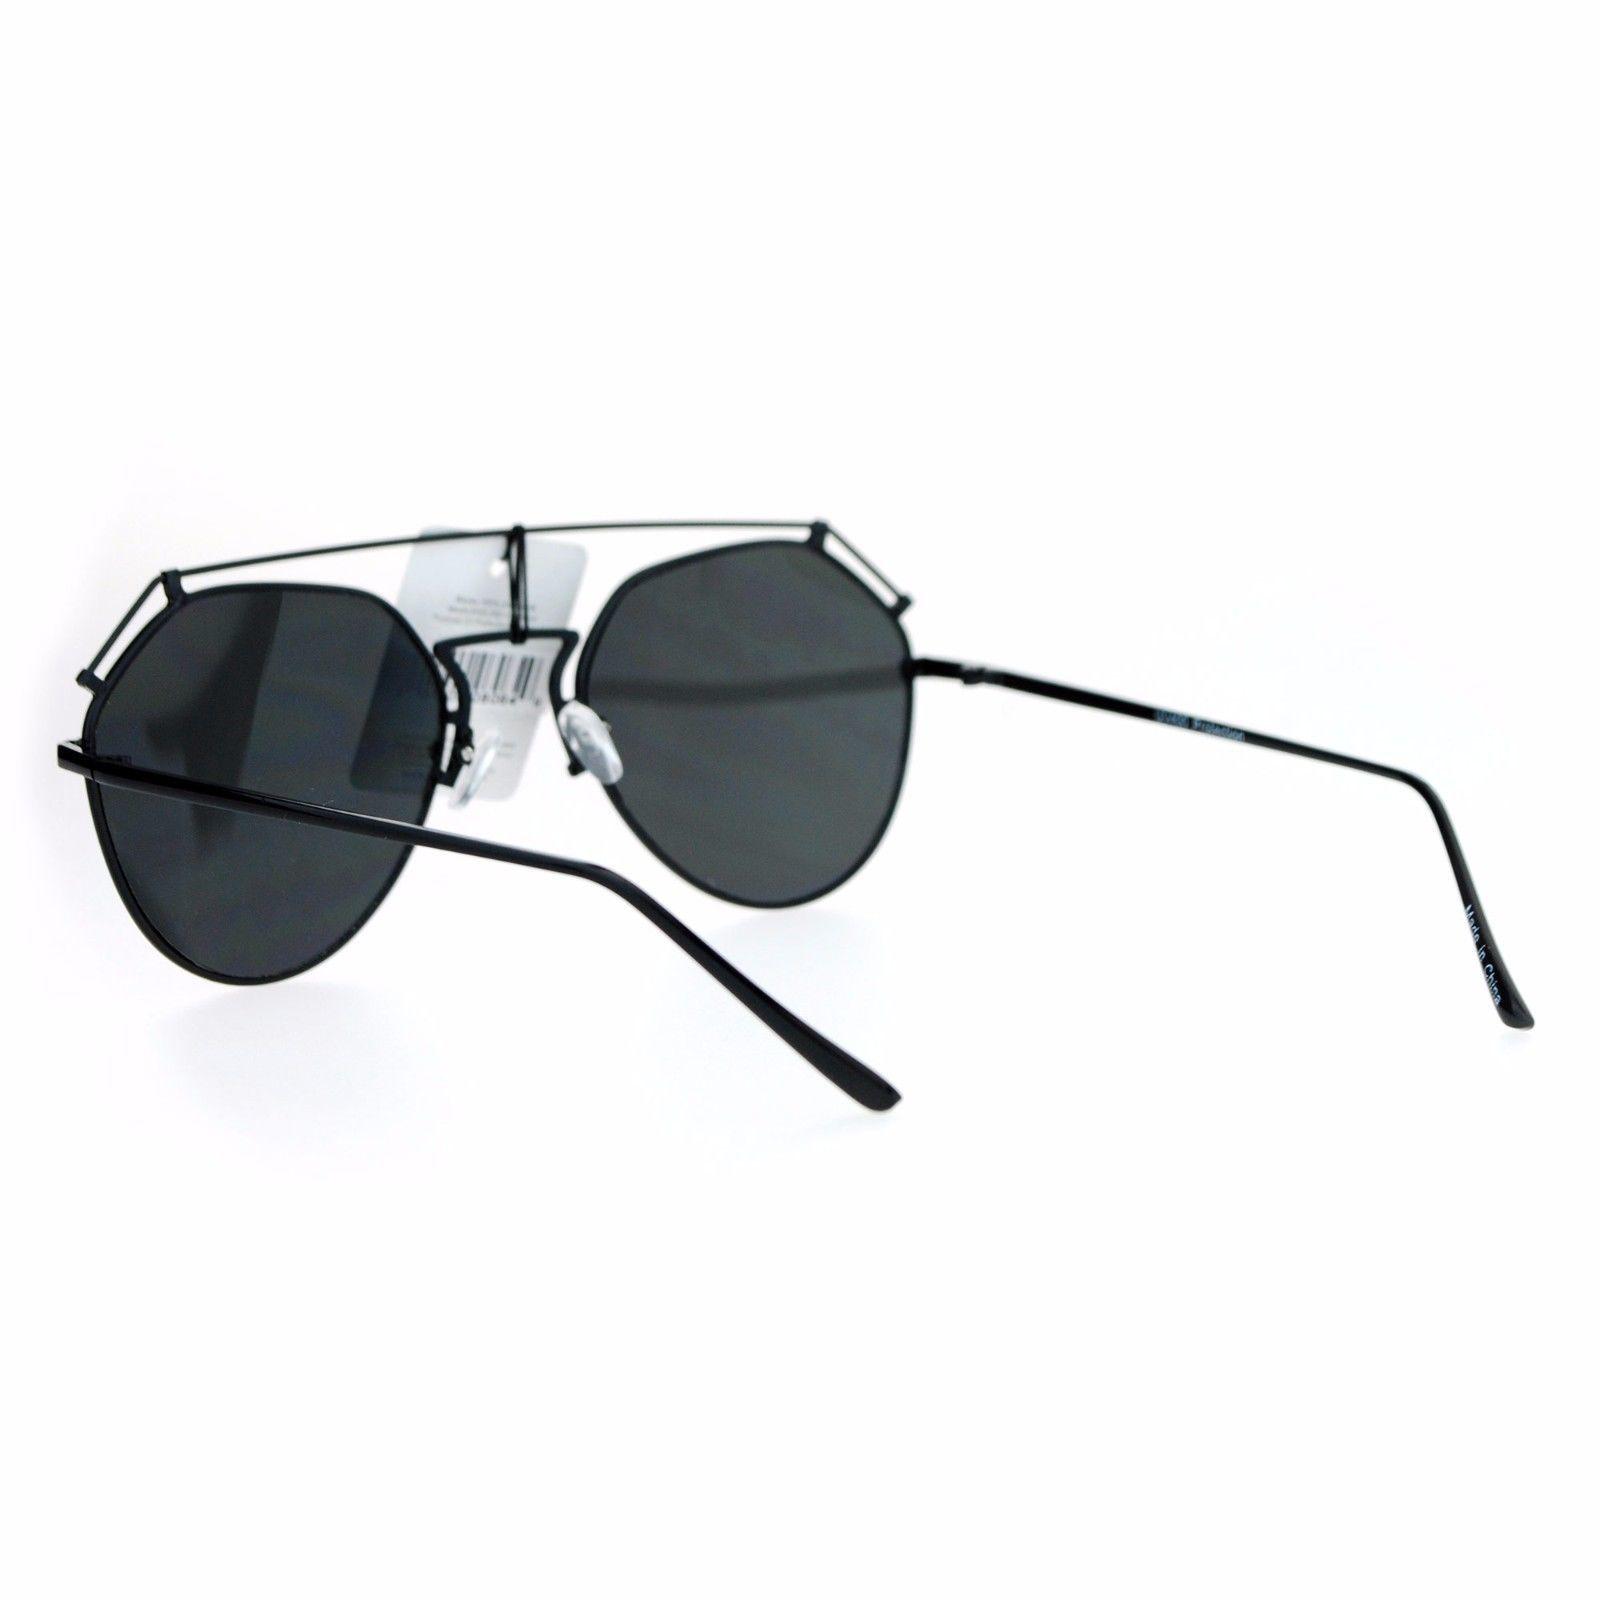 Womens Retro Aviator Sunglasses Flat Wire Top Metal Frame Aviators